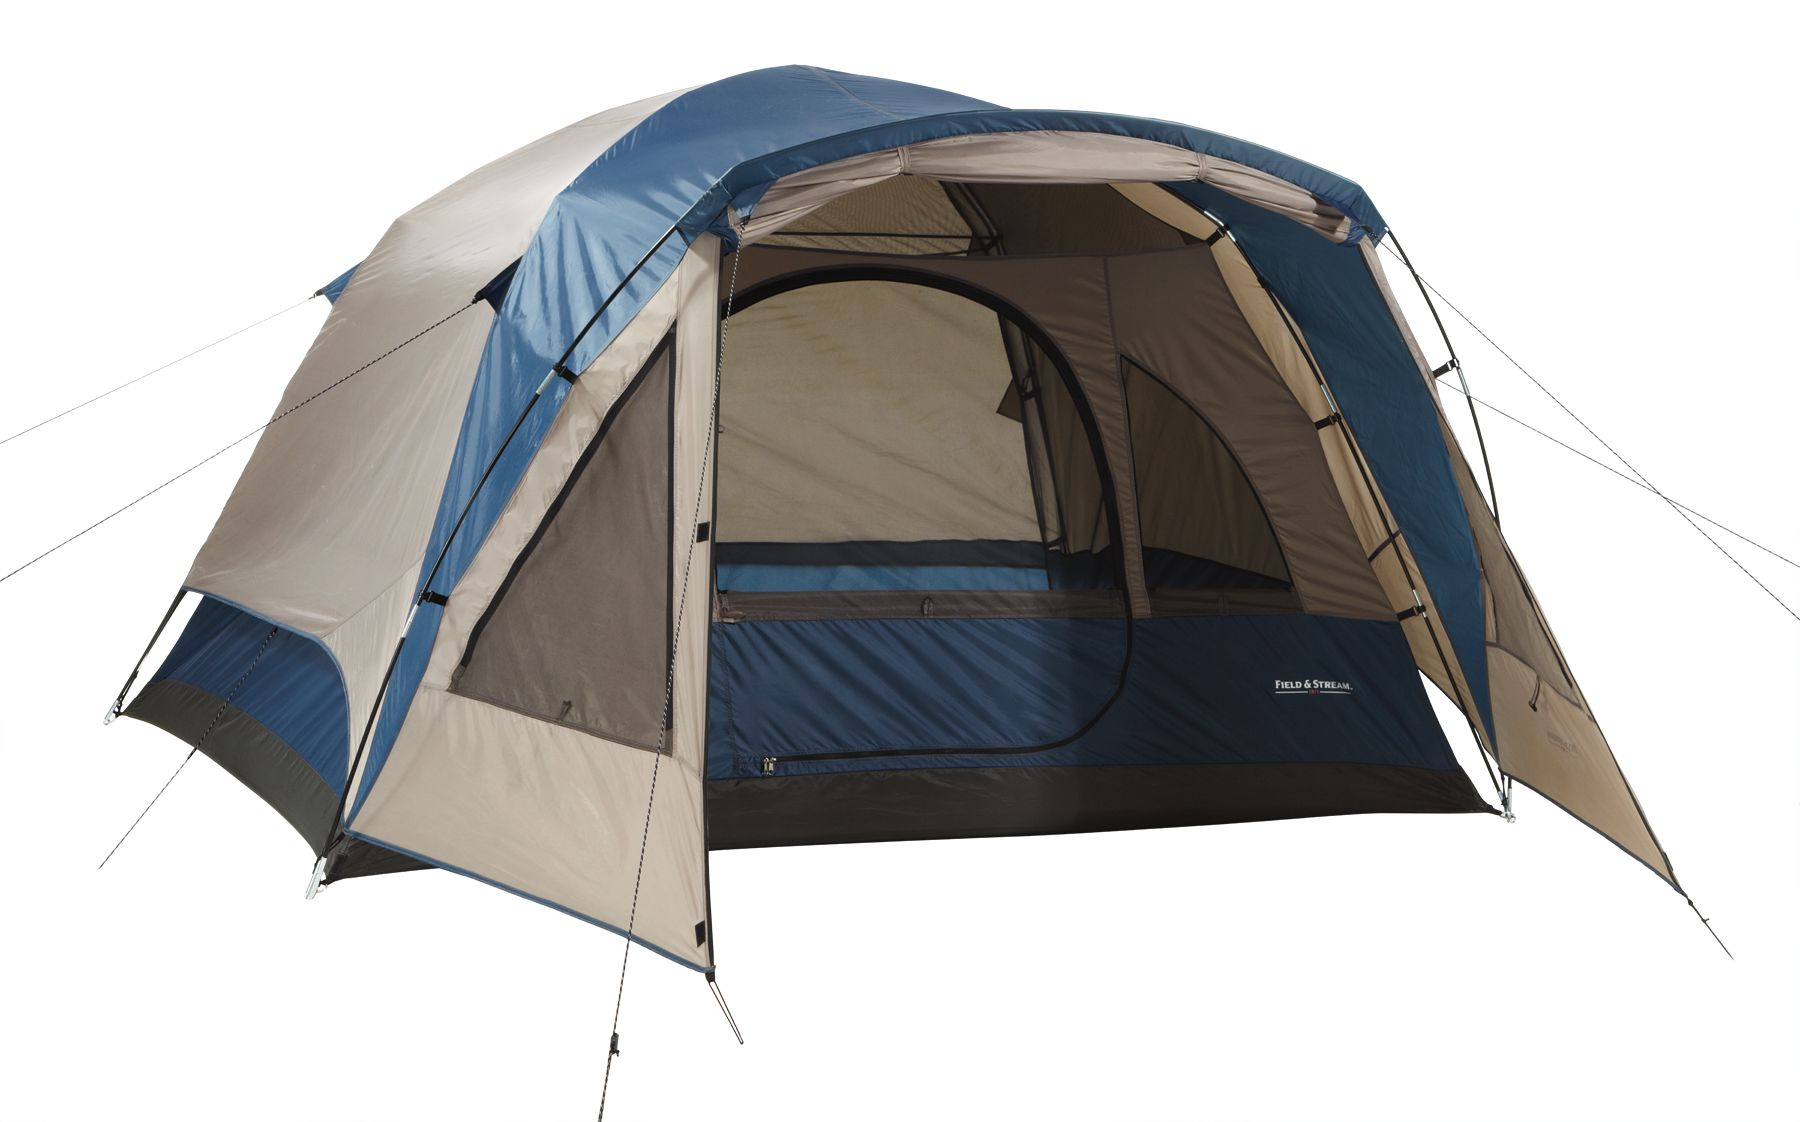 1  sc 1 th 177 & Field u0026 Stream Wilderness Lodge 4 Person Tent | DICKu0027S Sporting Goods